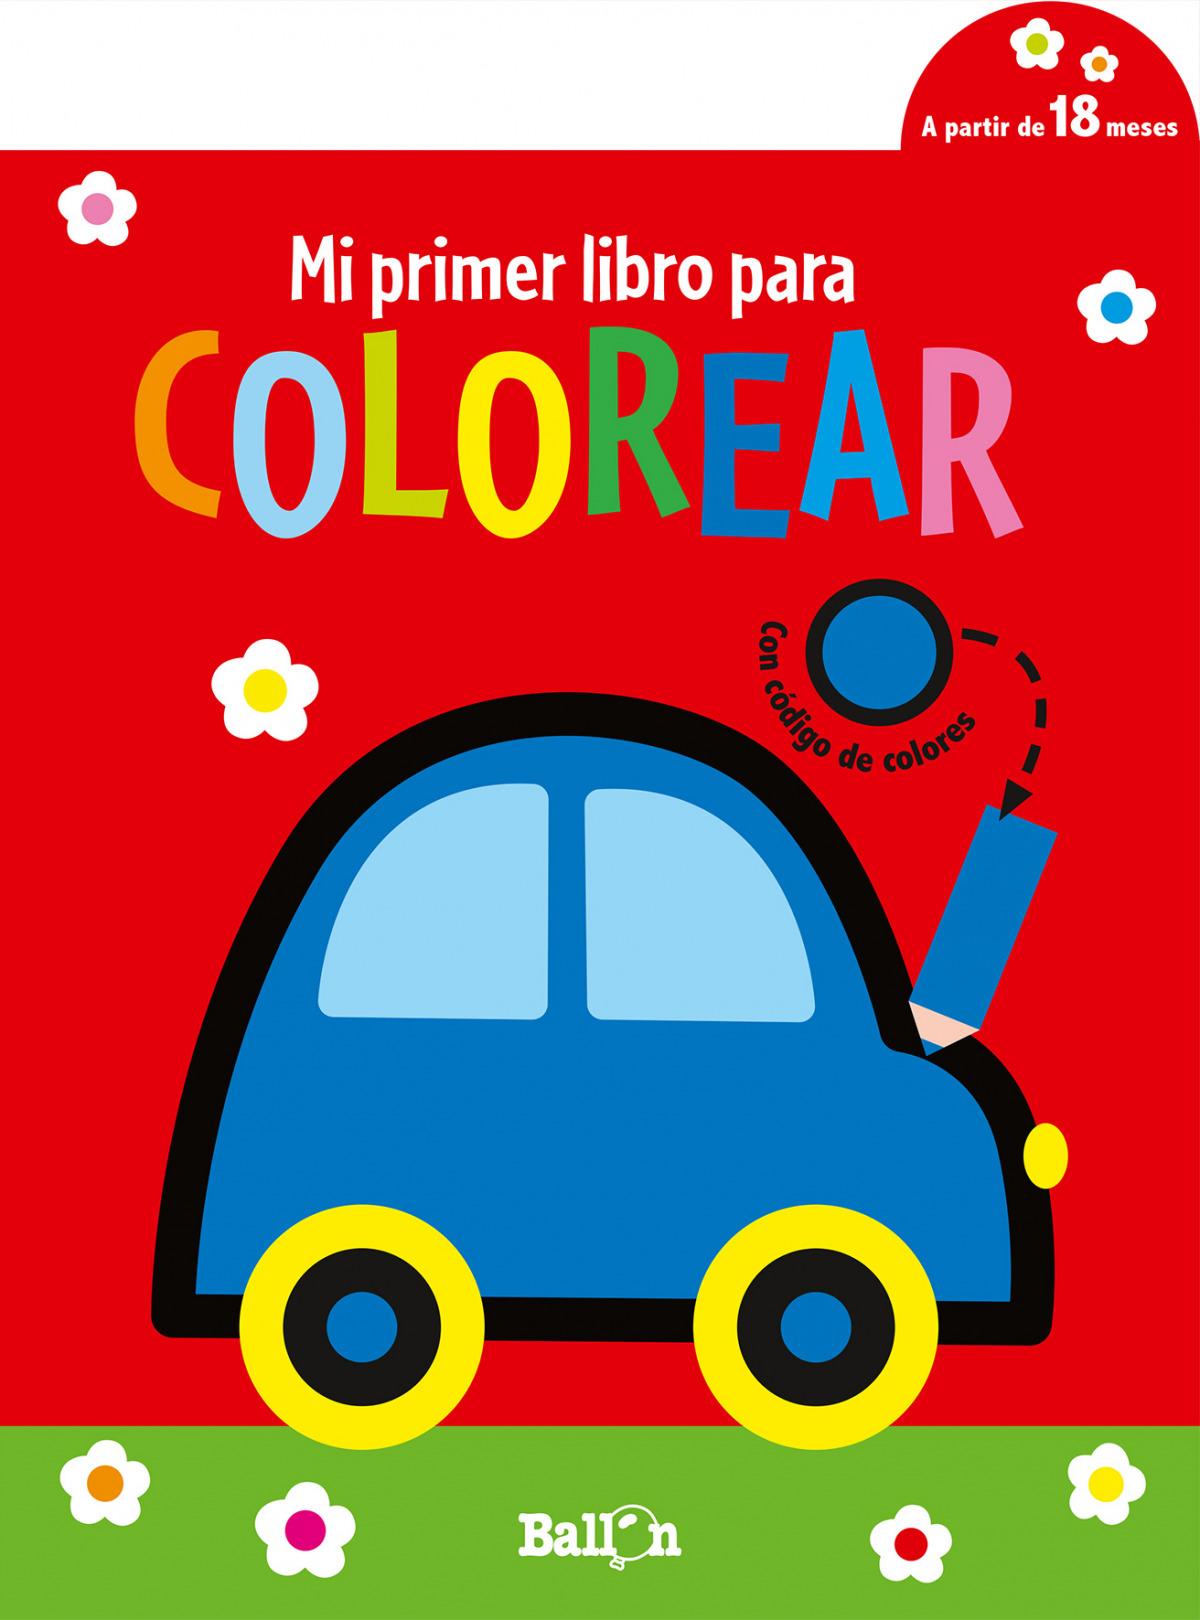 MI PRIMER LIBRO PARA COLOREAR- COCHE